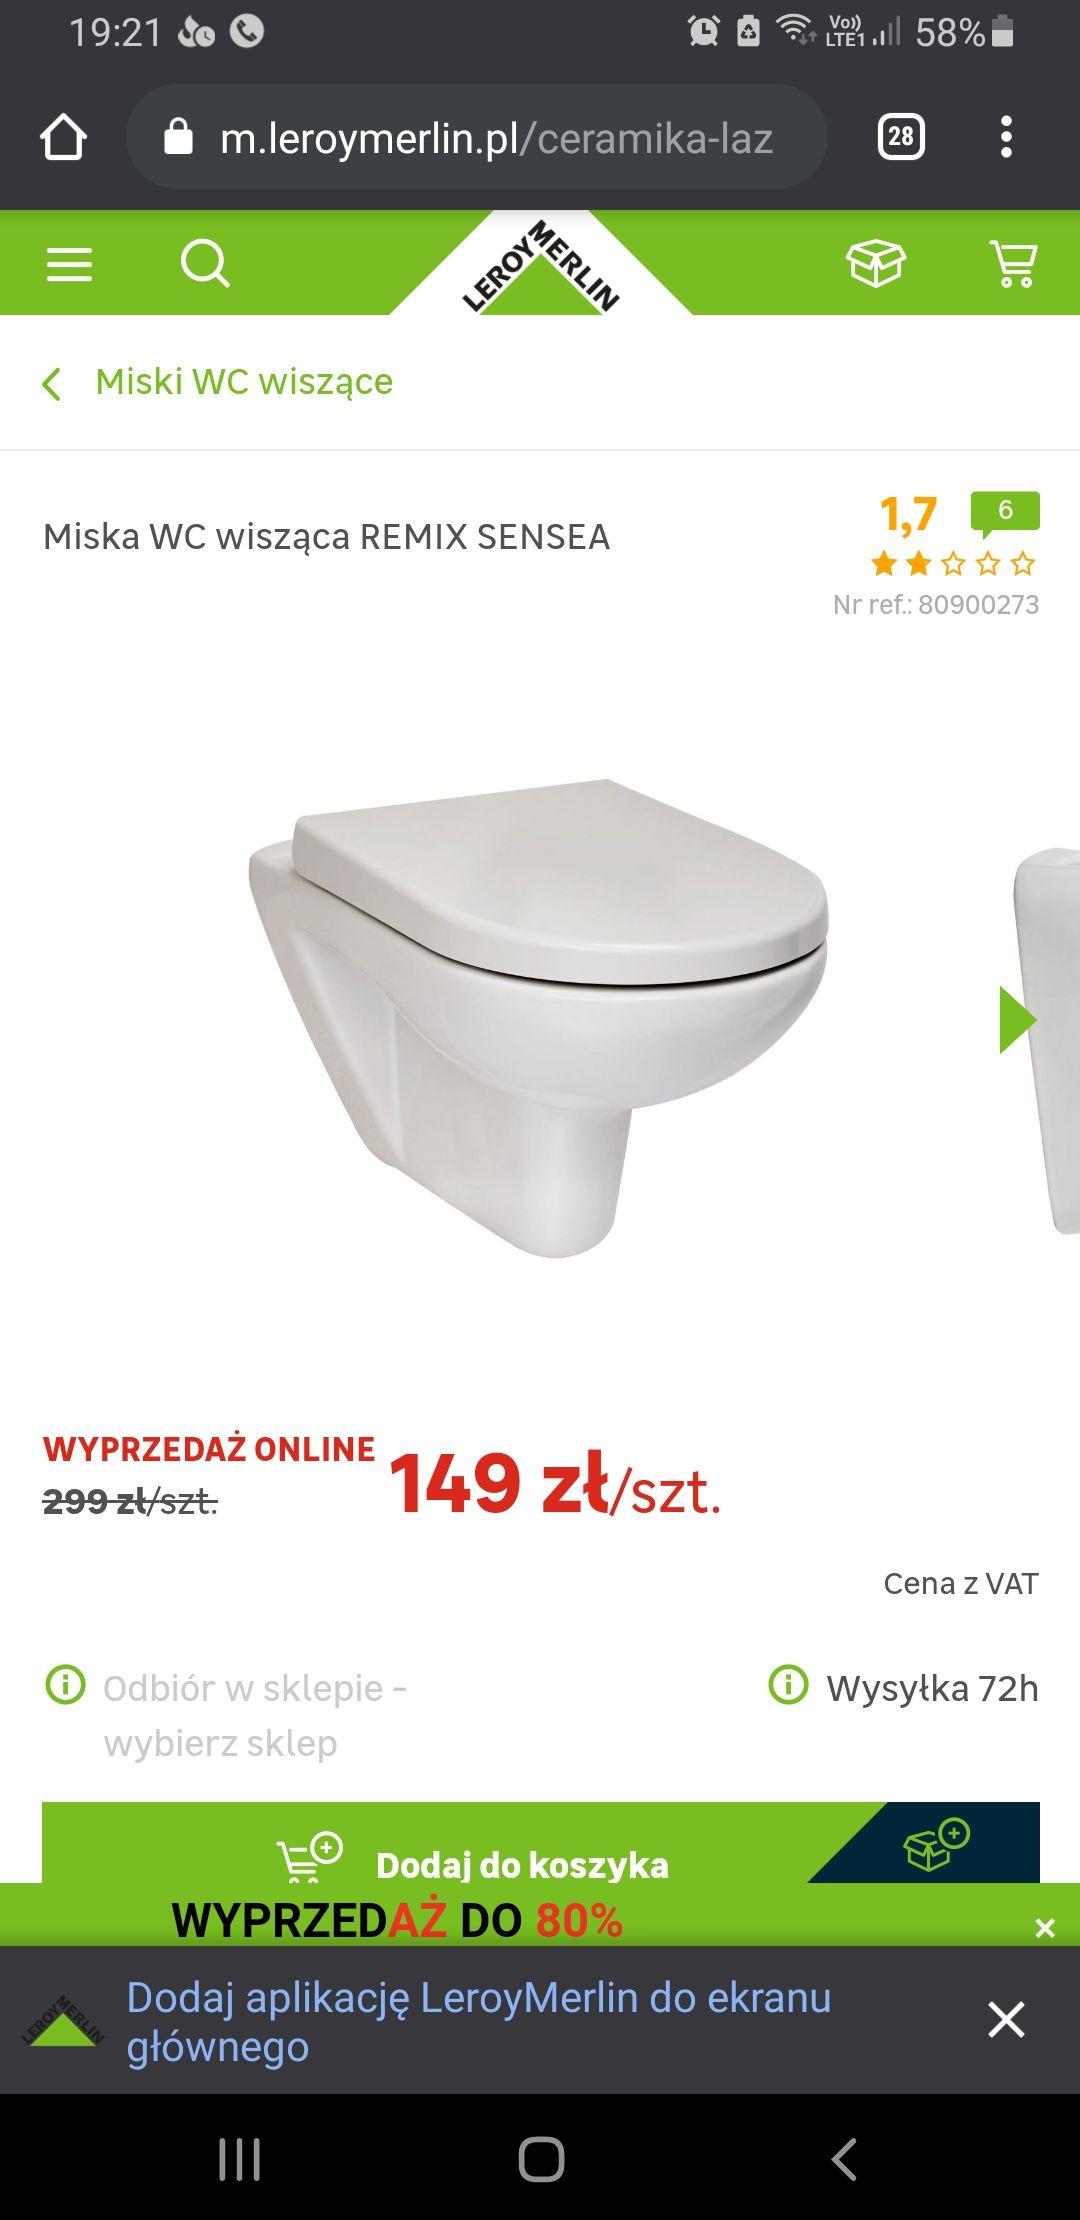 Miska wisząca WC Remigiusz Sensa